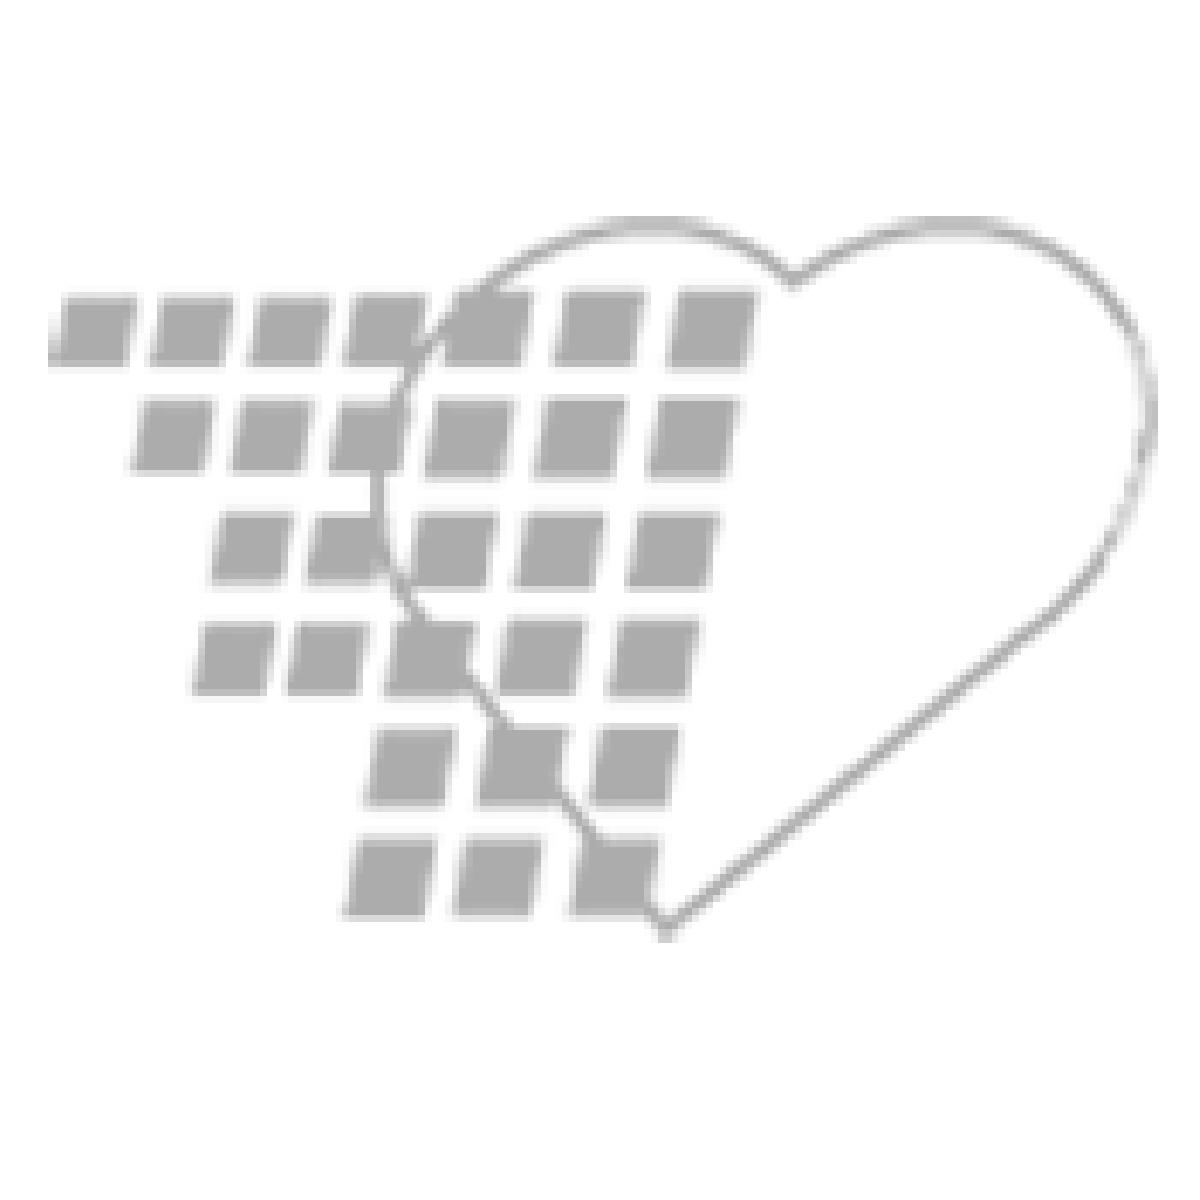 05-02-0411 Sterile Lube Jelly Syringe 10 g